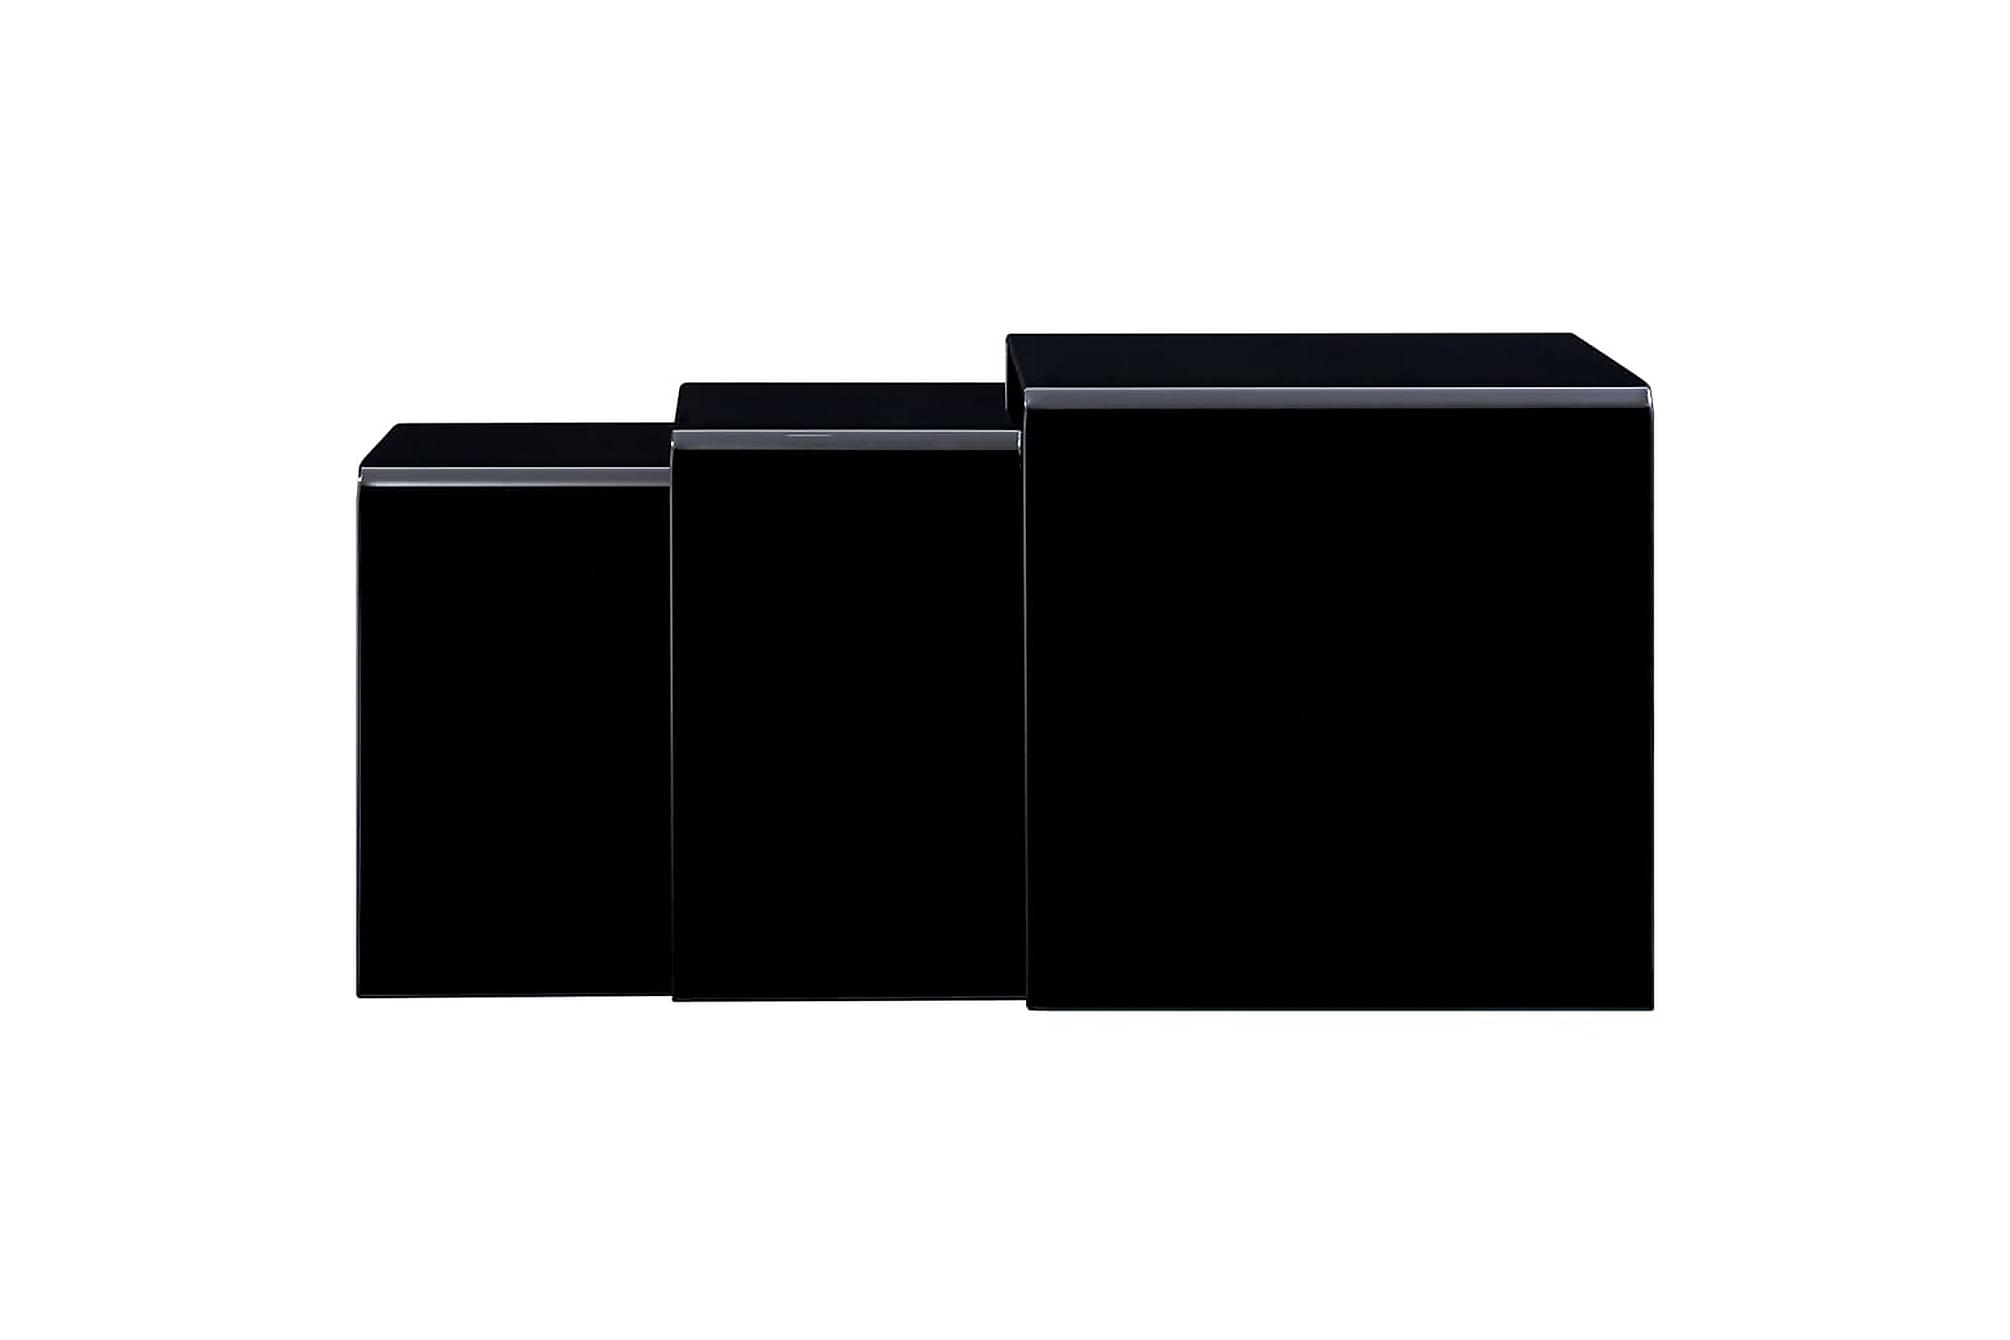 Satsbord 3 st svart 42x42x41,5 cm härdat glas